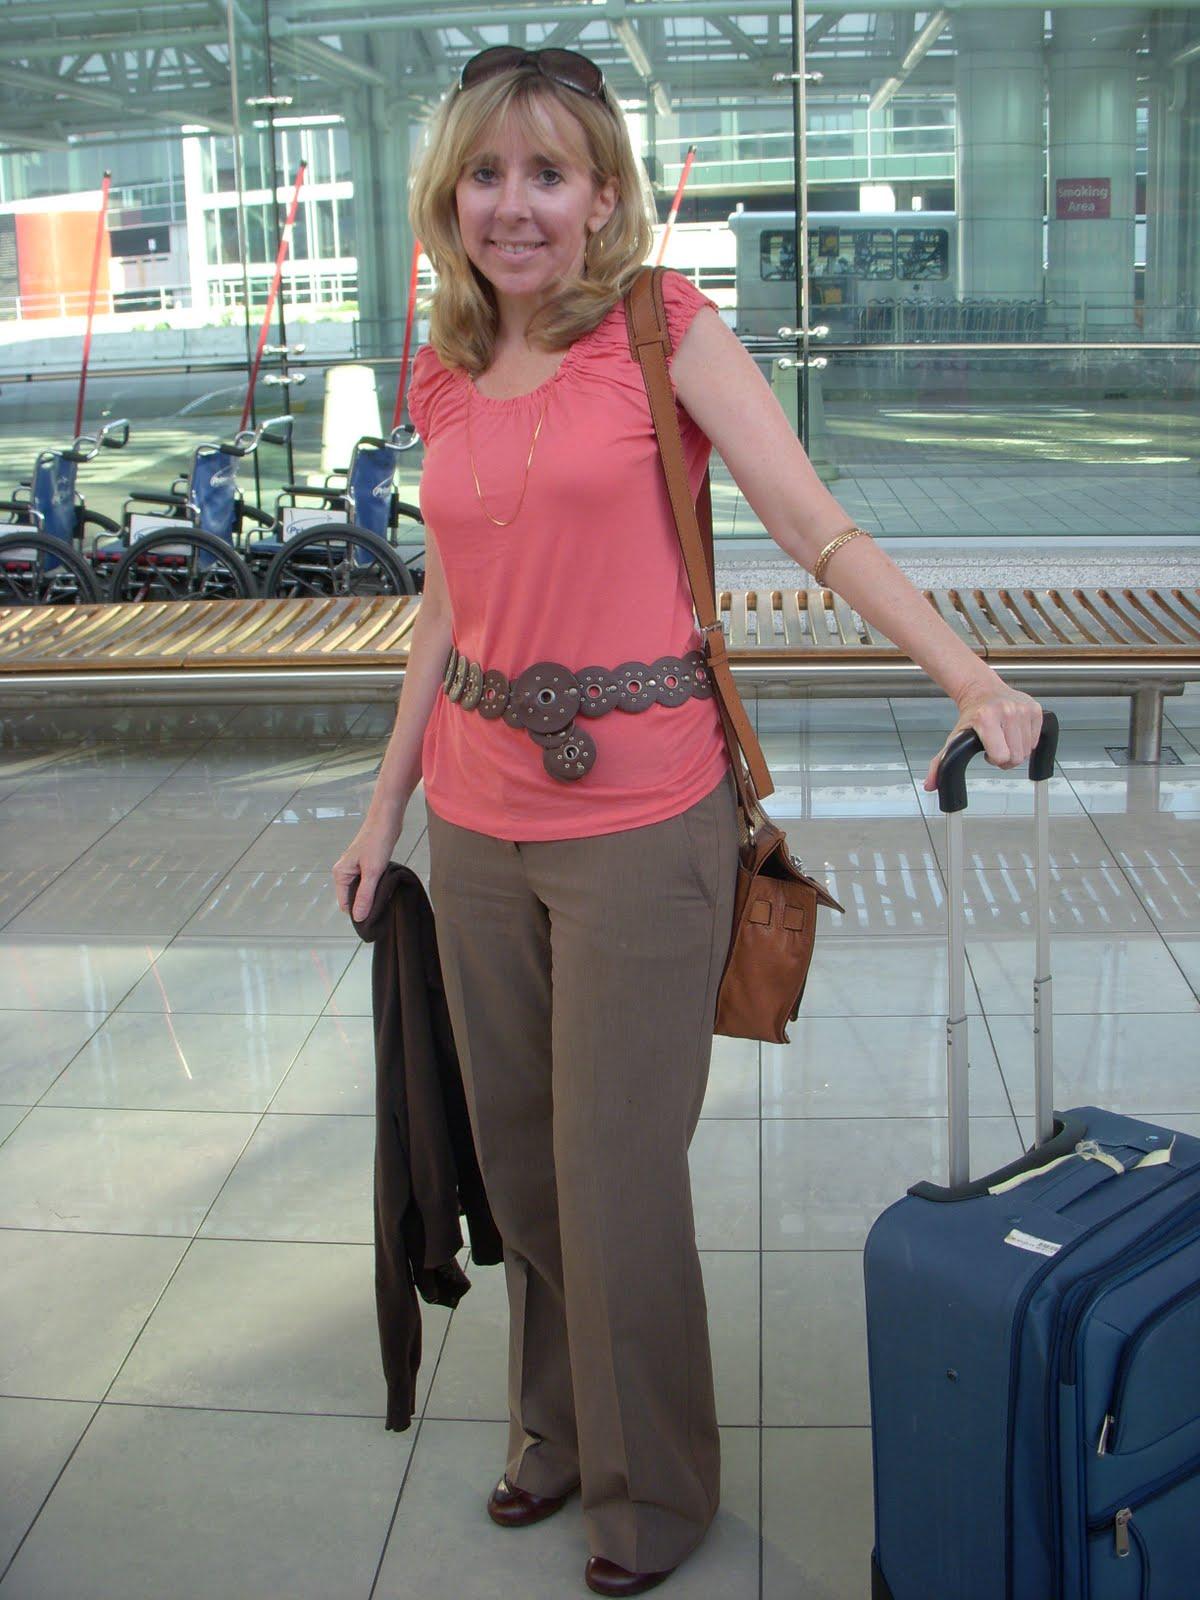 Airport milf